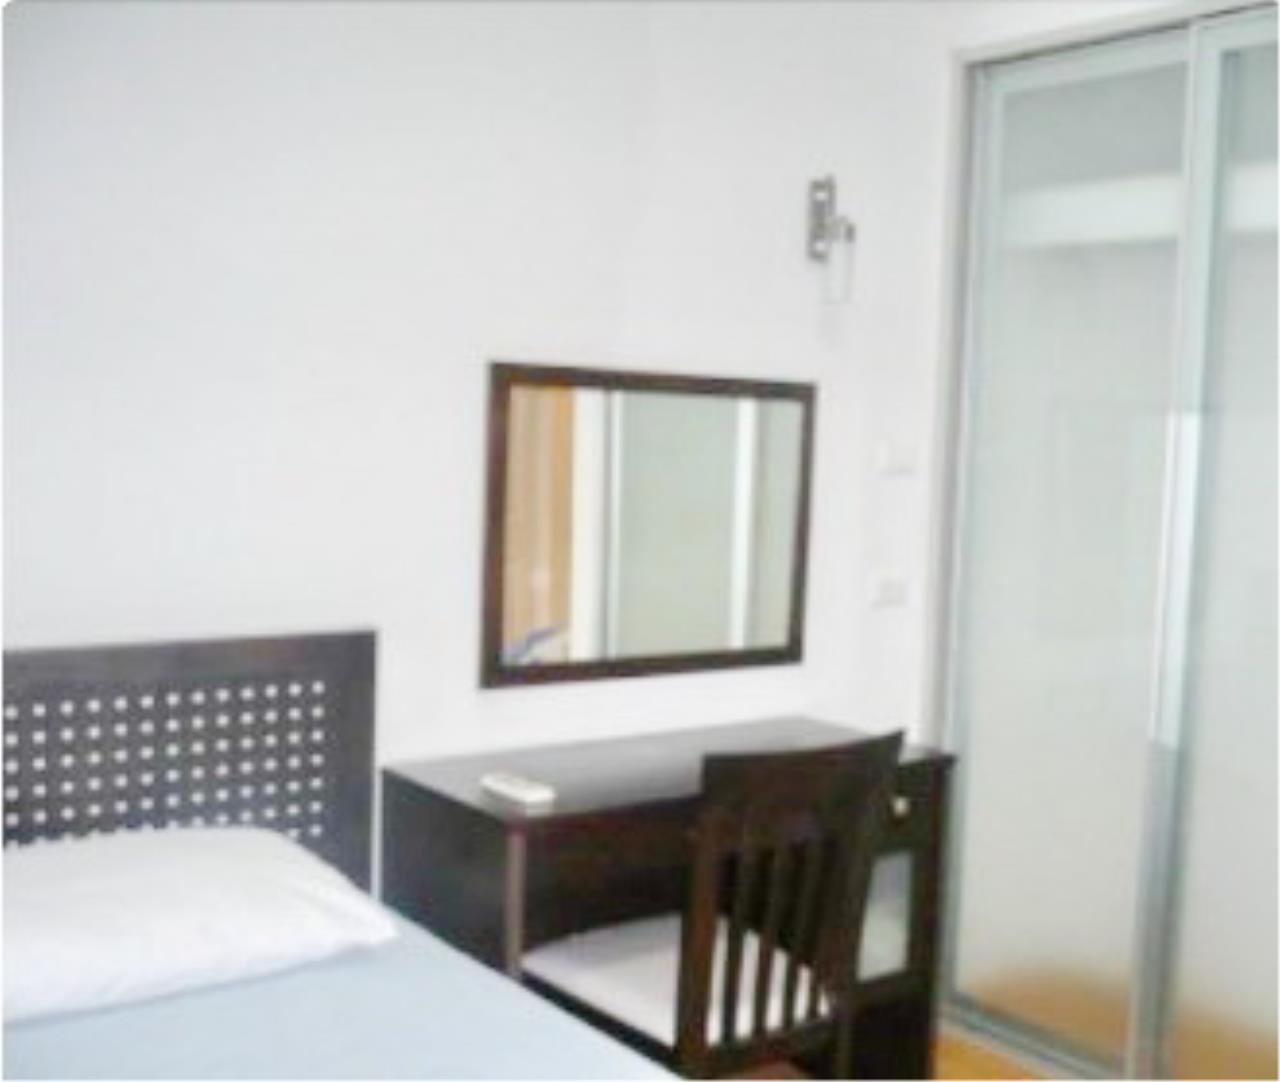 Agent - Mayteekul Sujirapinyokul Agency's AC6180418 For Rent Condo Supalai Premier Place Asoke Condo MRT Phetchaburi 1